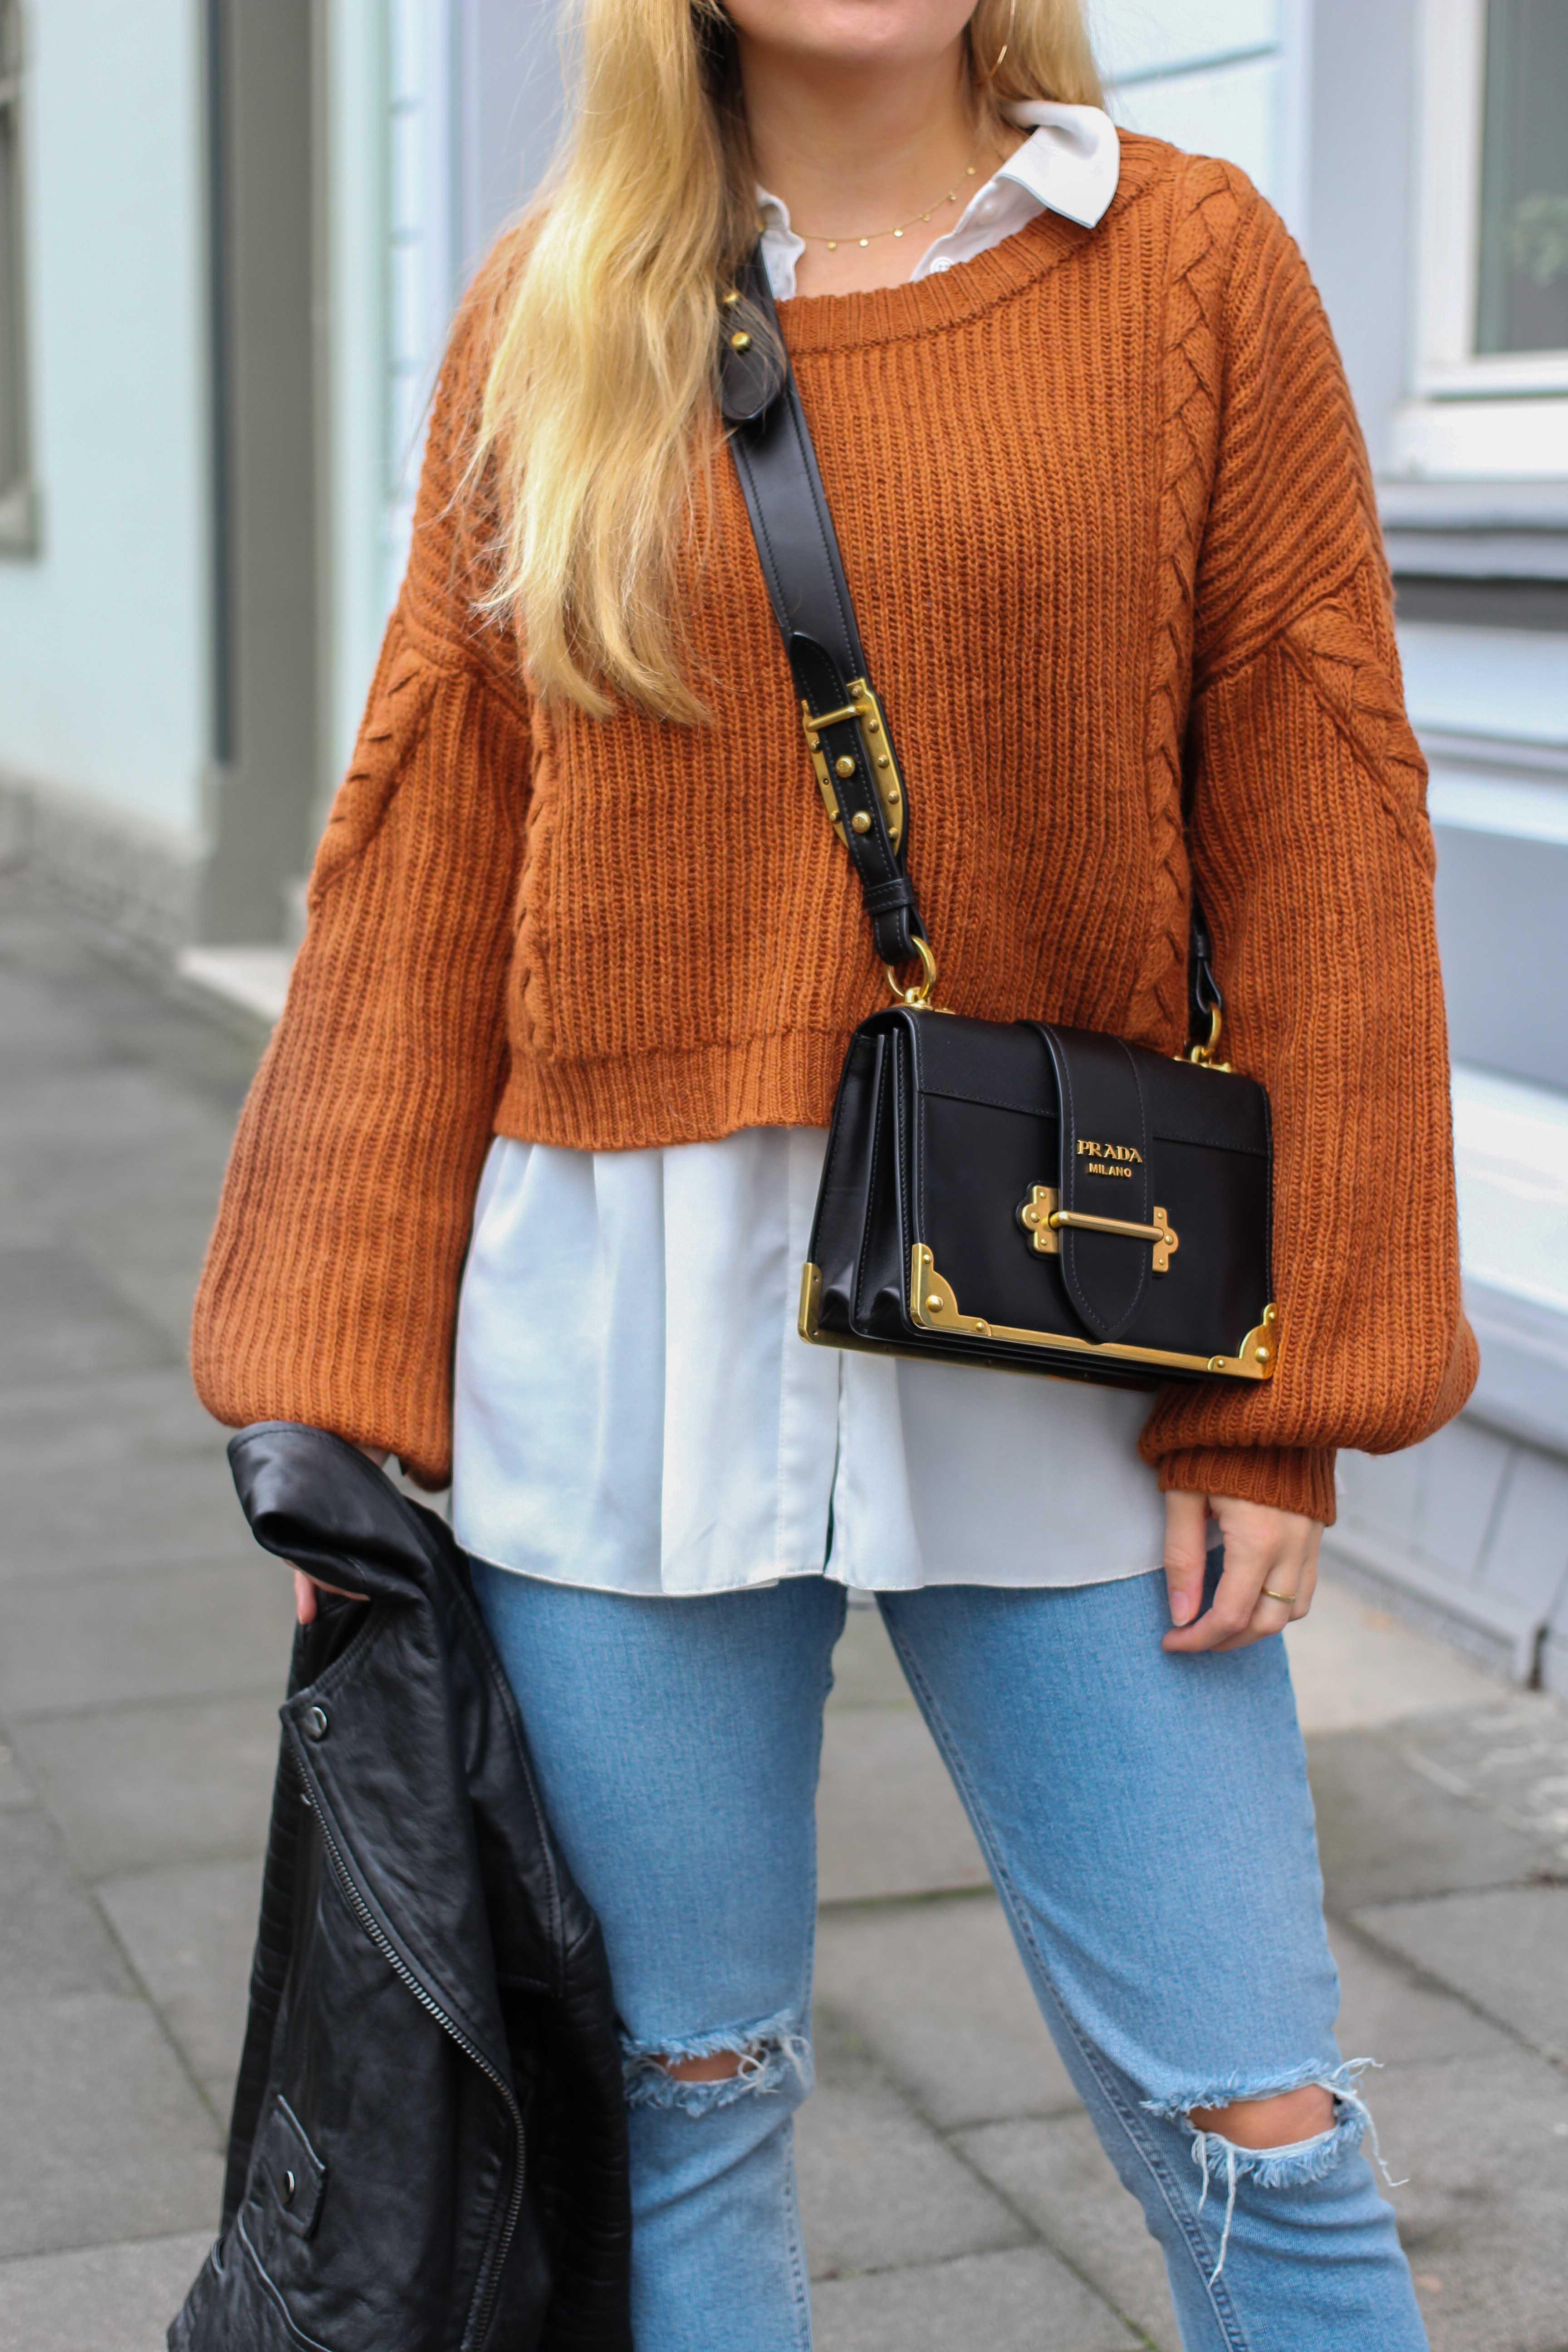 Übergangslook Layering Bluse kombinieren zerrissene Jeans Modeblog Outfit Streetstyle Köln Prada Cahier Bag Prada Tasche Outfit 5